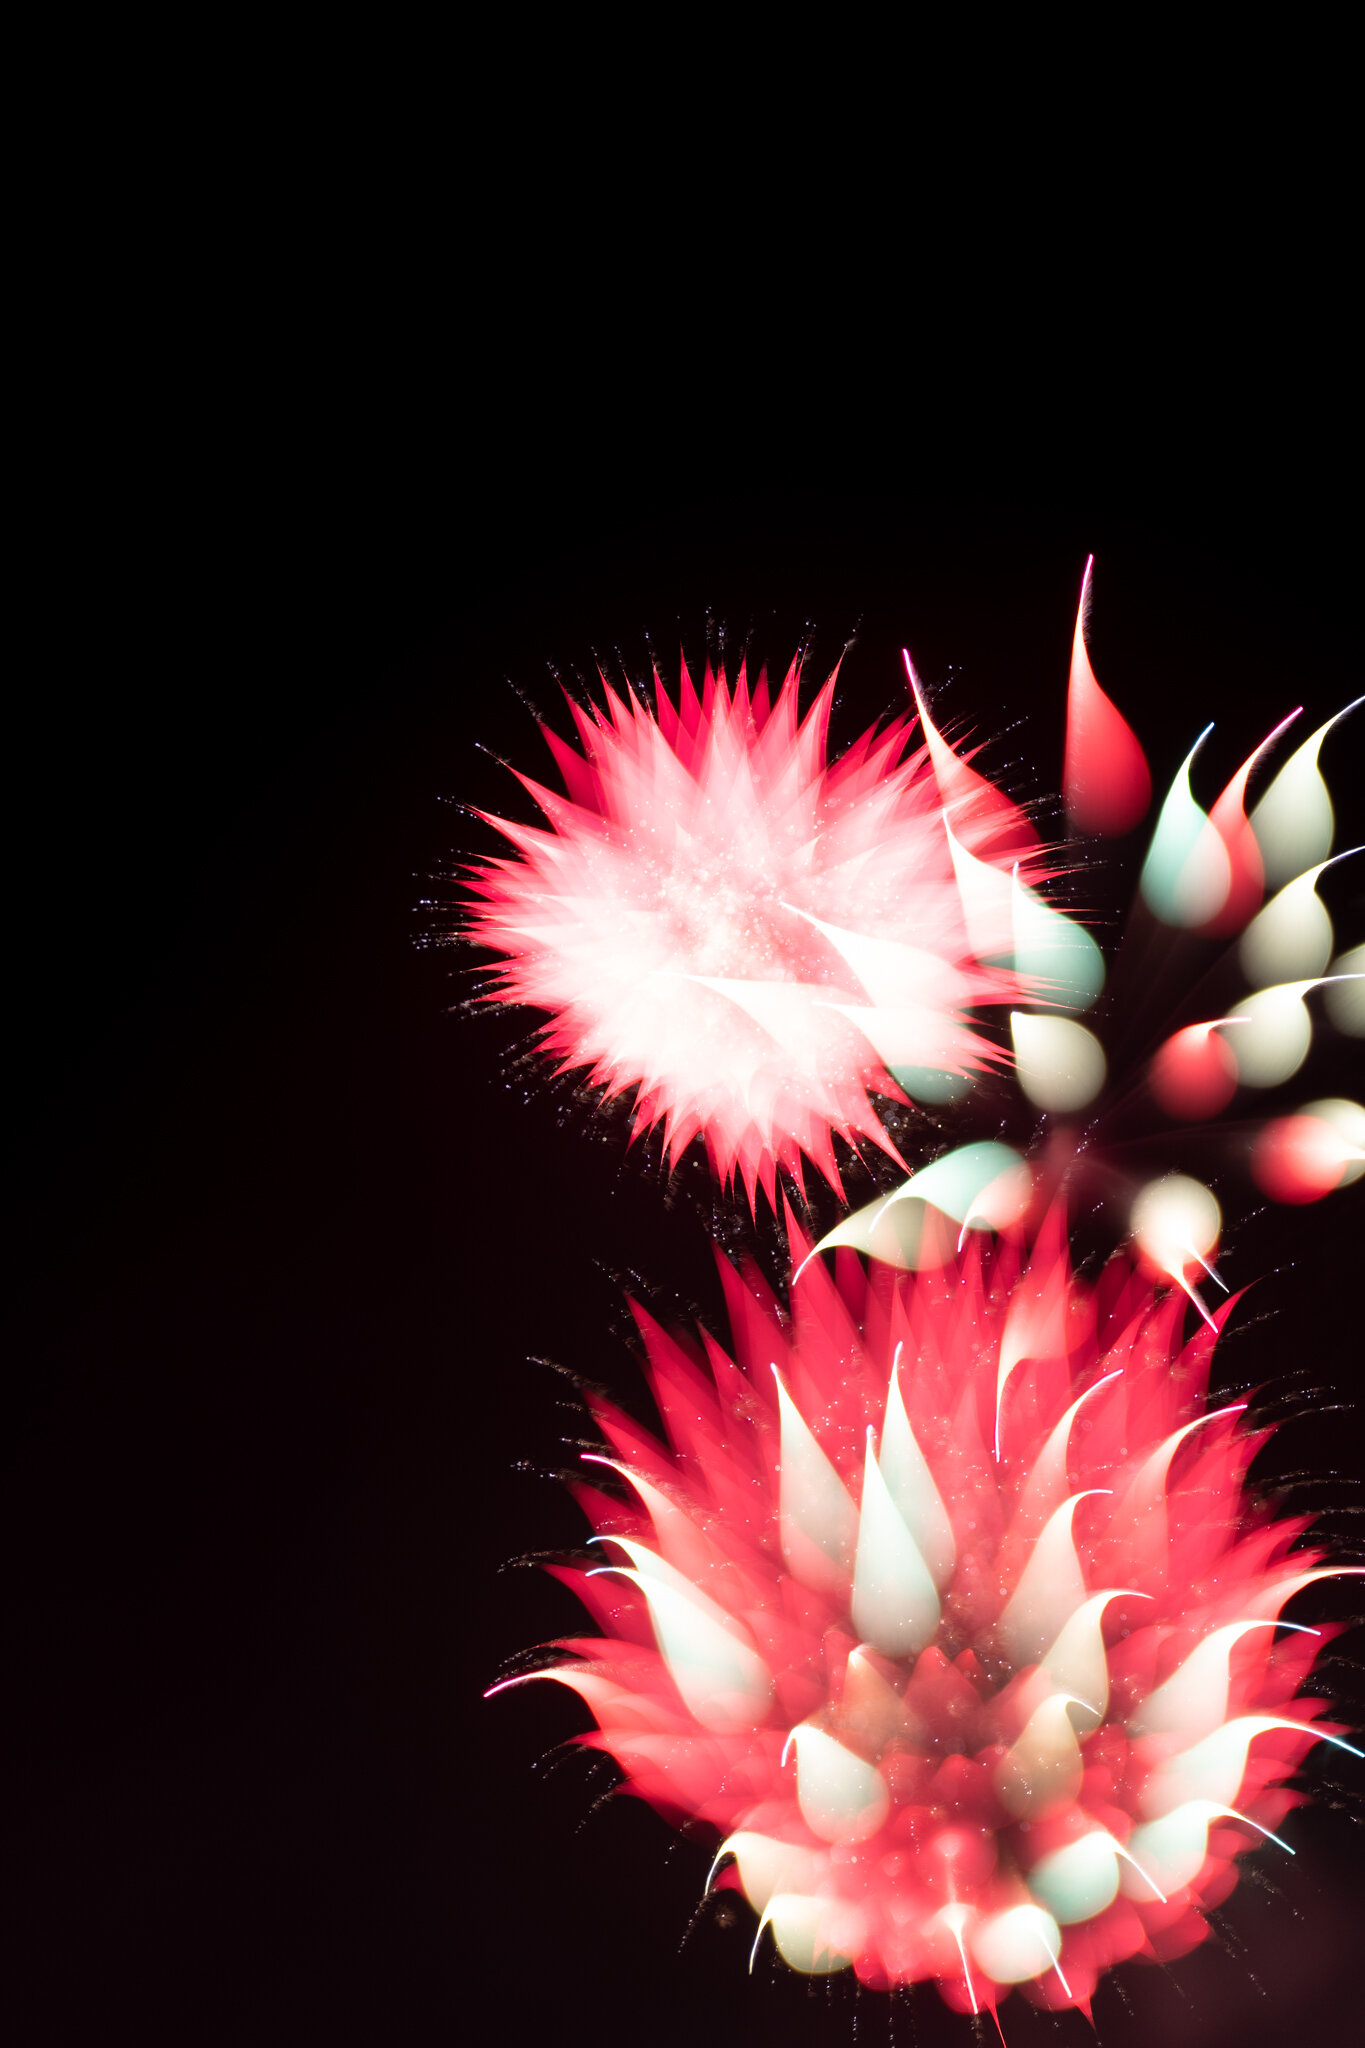 focuspulledfireworks-38.jpg